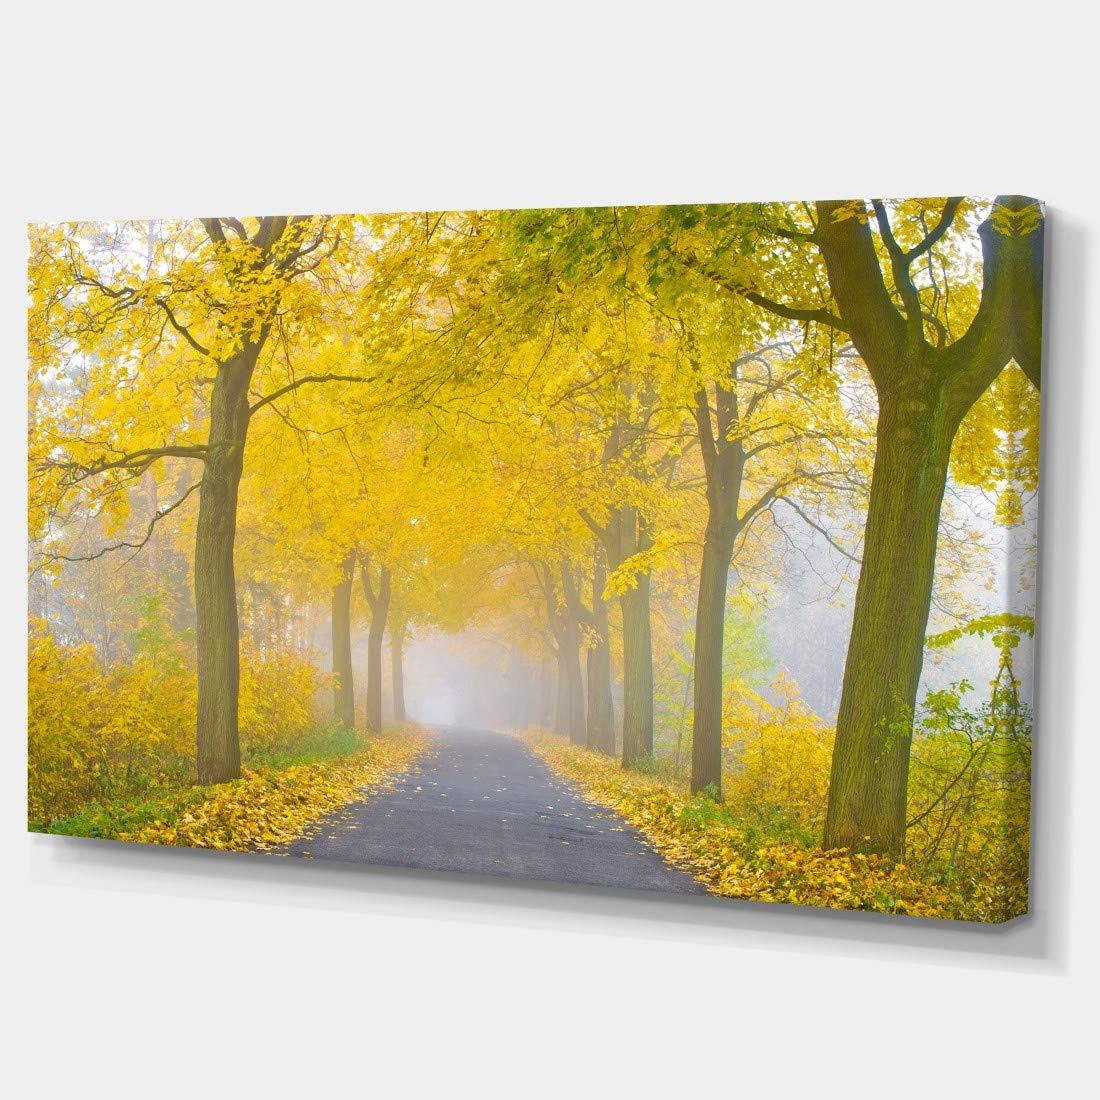 28 H/x/48 W/x/1 D 4P Blue Designart Bright Sun in Misty Mountains-Landscape Photo Canvas Print-48x28 4 Piece